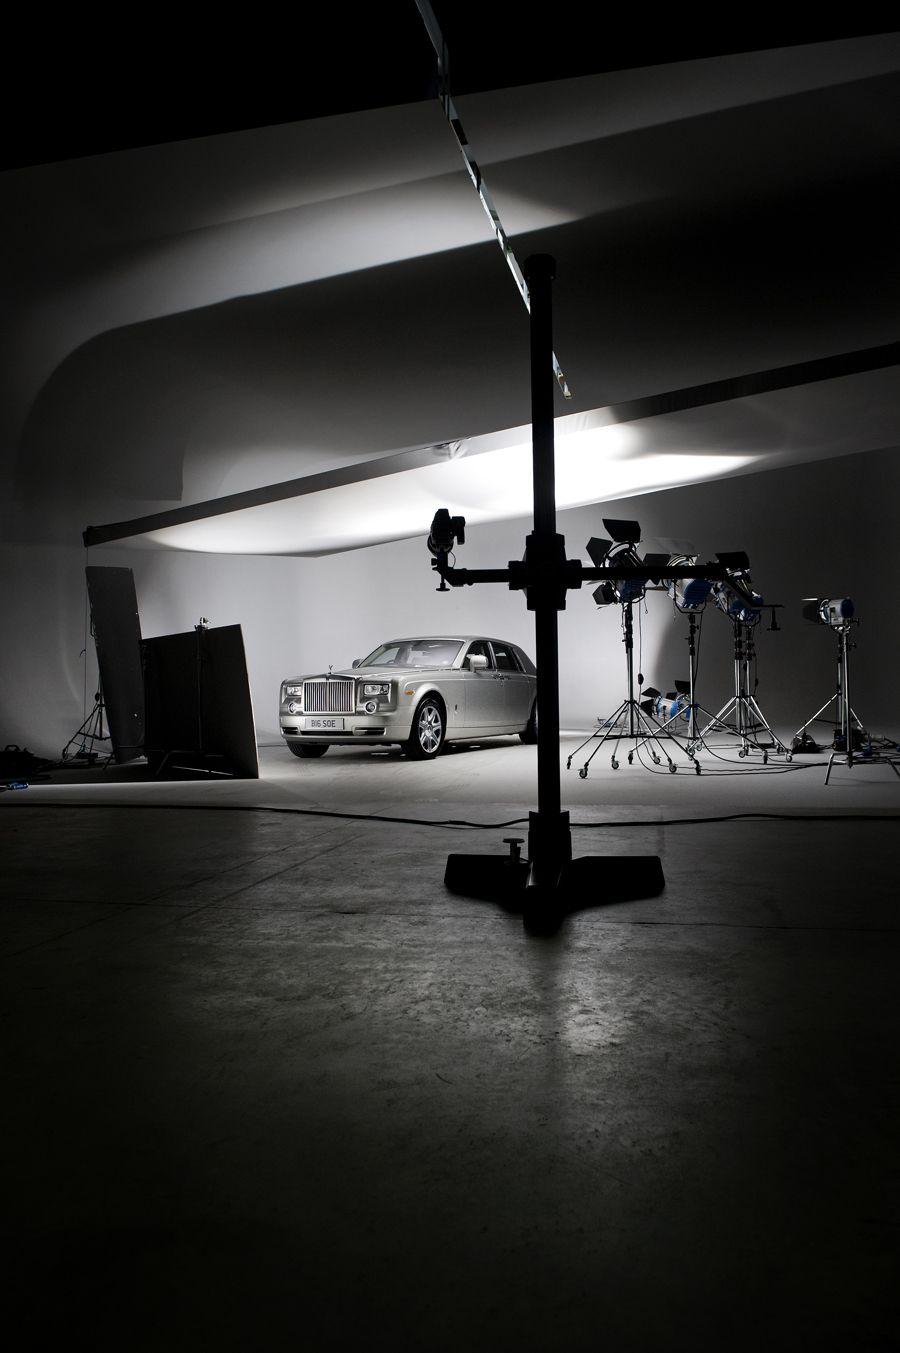 Tim Wallace Car Photography Fotostudio Beleuchtung Fotostudio Fotos